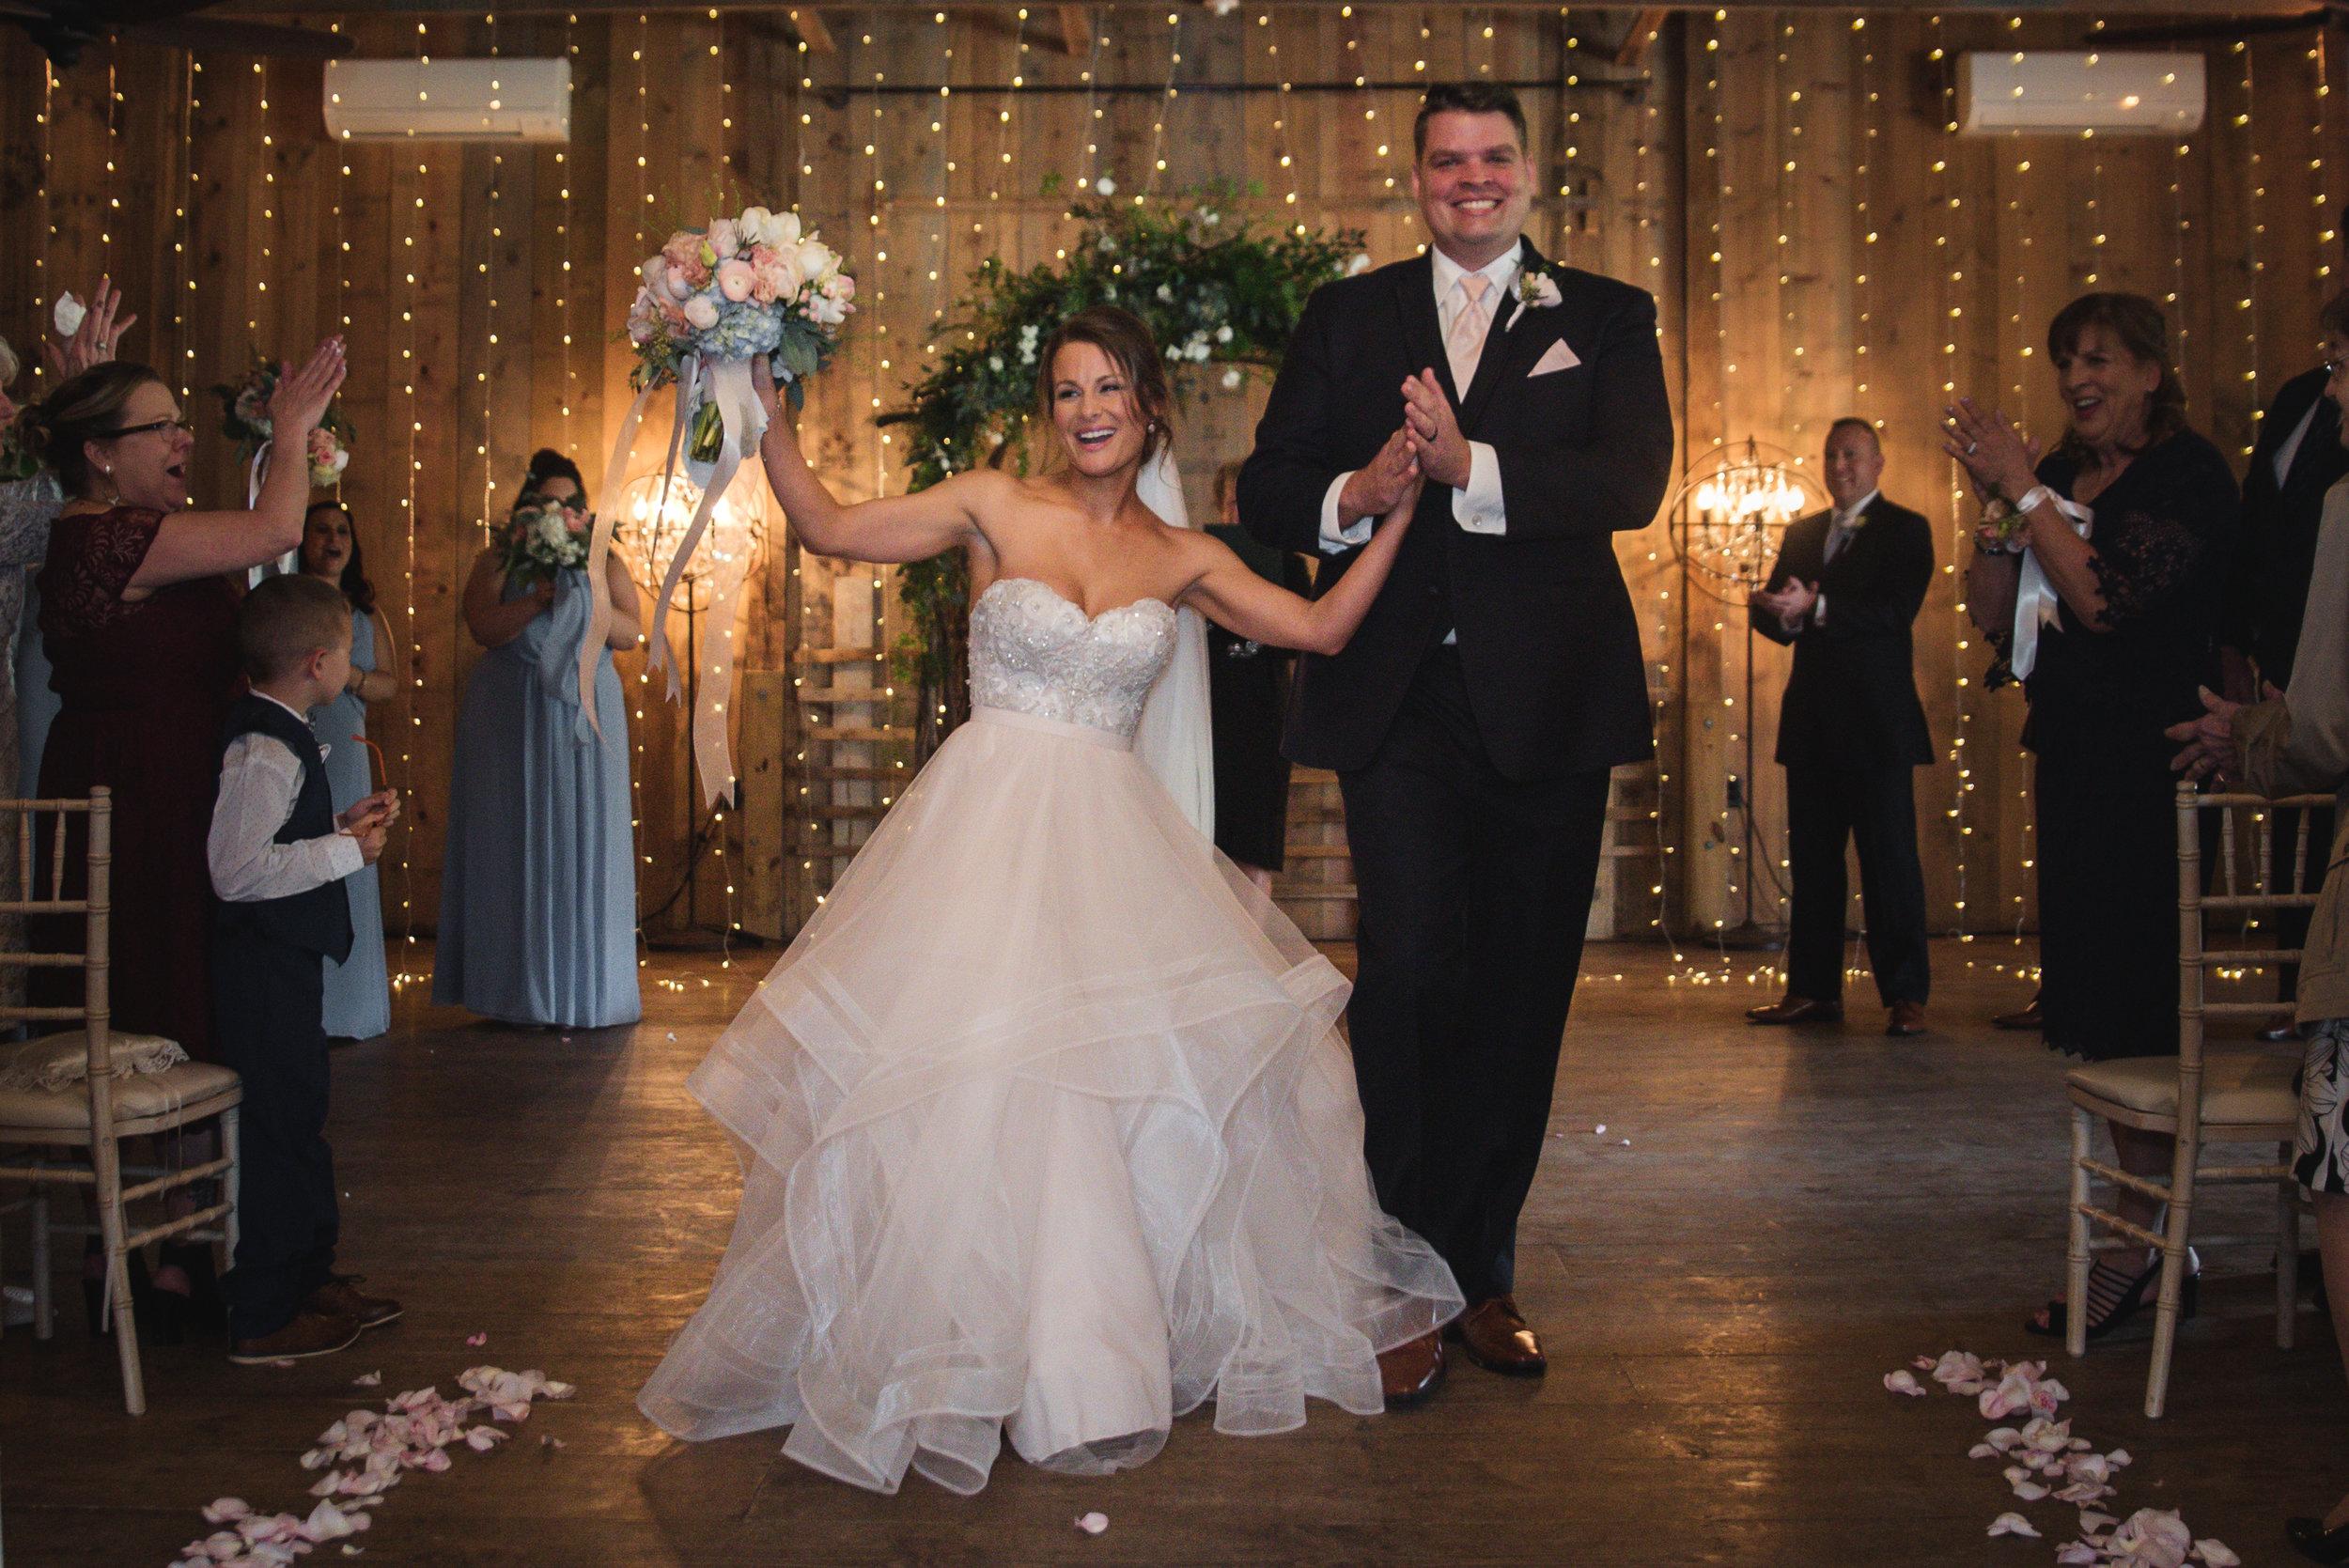 inclusive wedding photographer in columbus